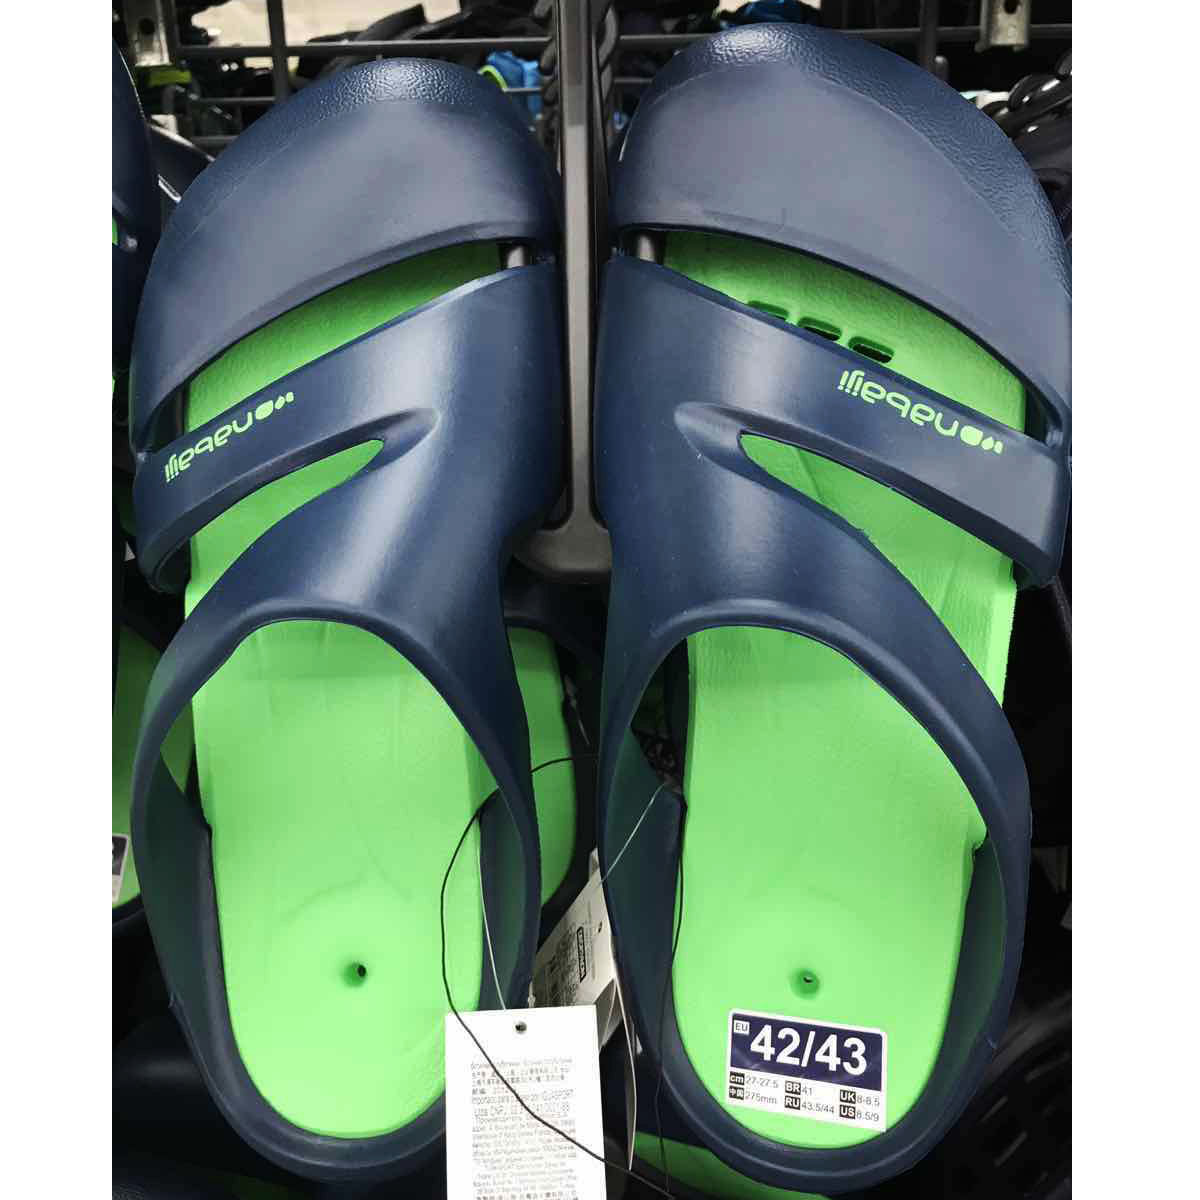 6556491c54 Sand swimming swimming shoes NABAIJI sandals Men s women s non-slip  Decathlon slippers Beach shoes sandals